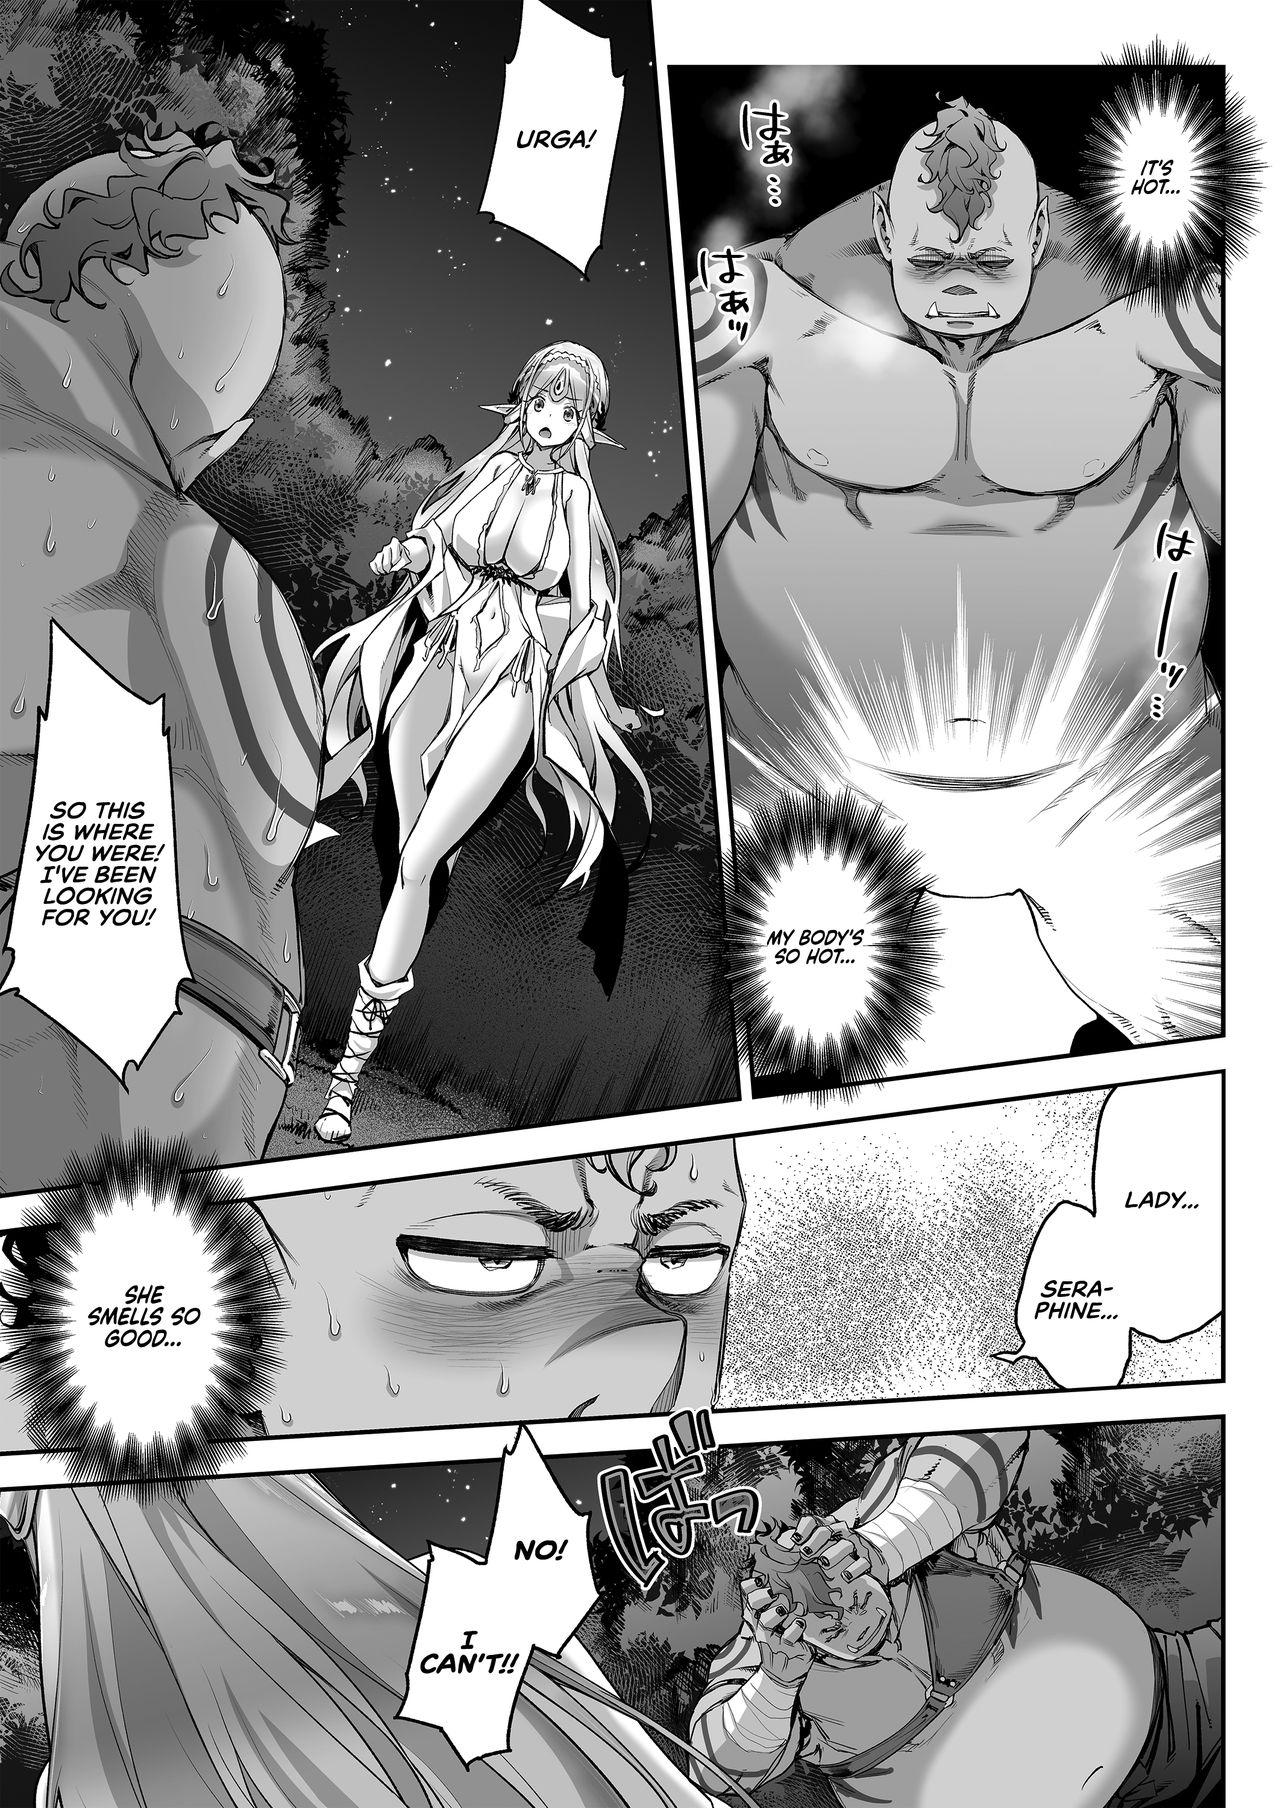 [Ichinose Land] Midara na Elf-san wa Orc-kun ga Osuki | The Lewd Elf likes the Orc [English] [RedLantern] [Digital] 15